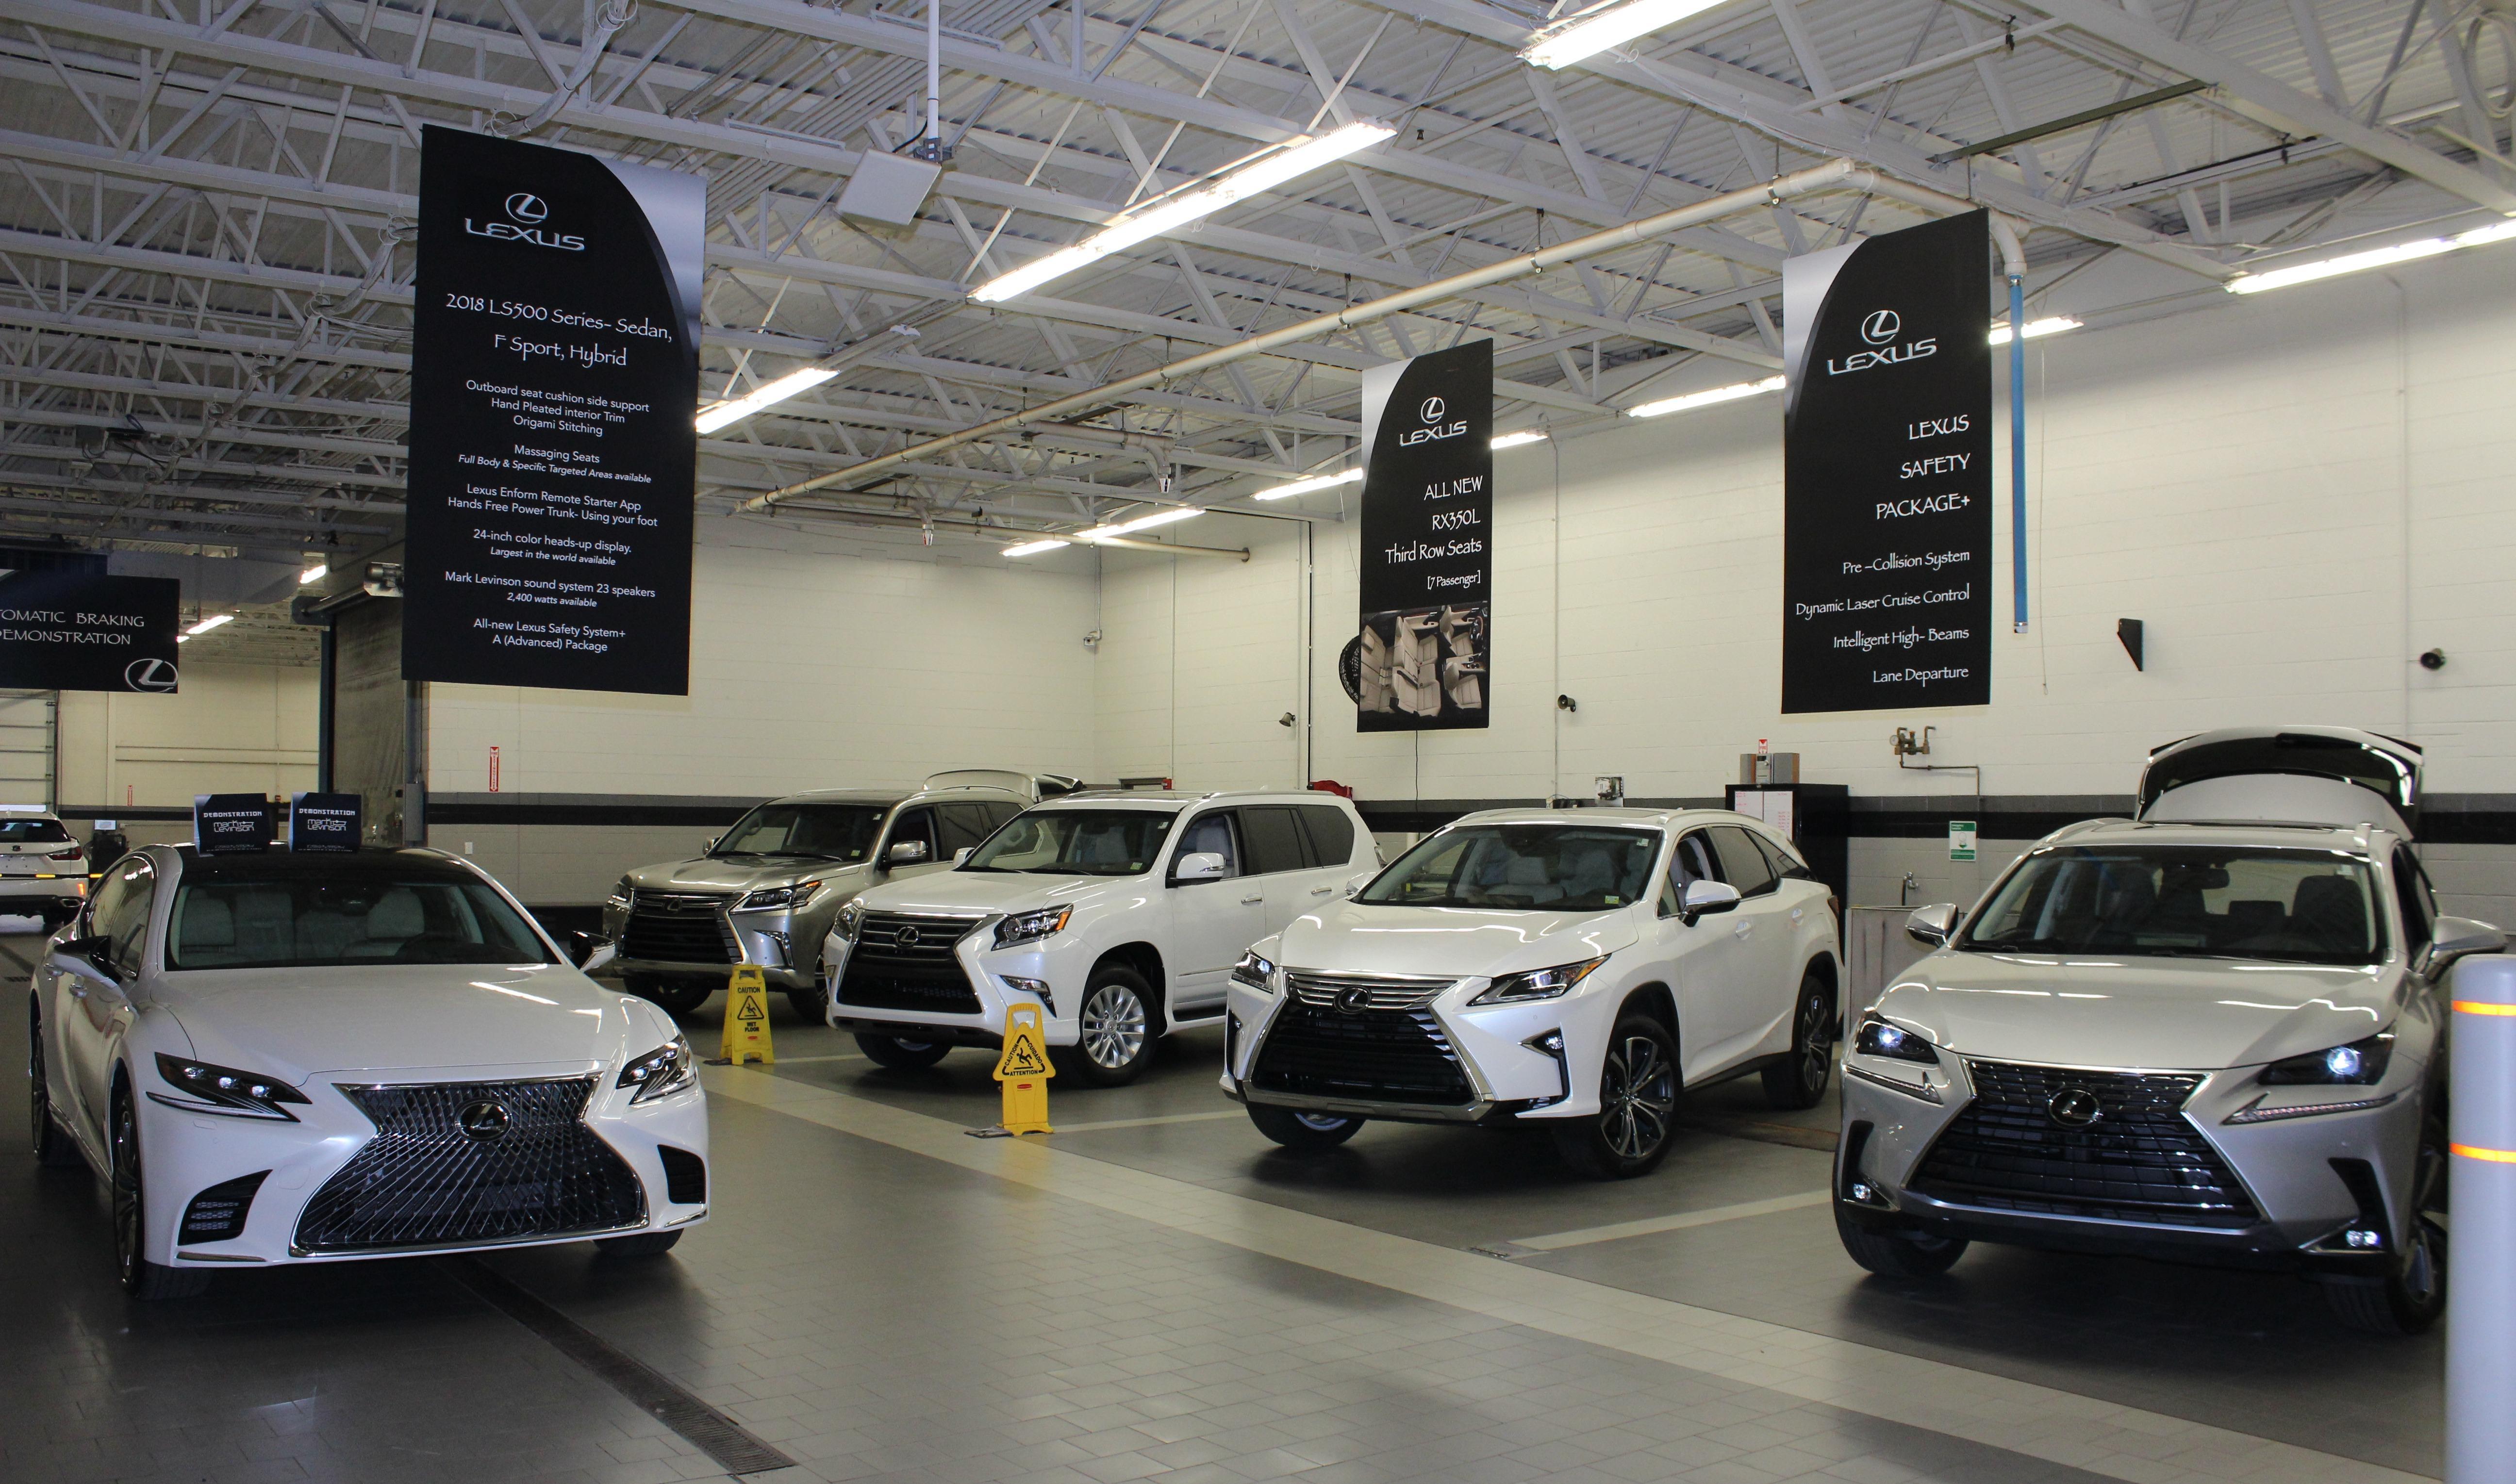 Northtown Lexus image 4